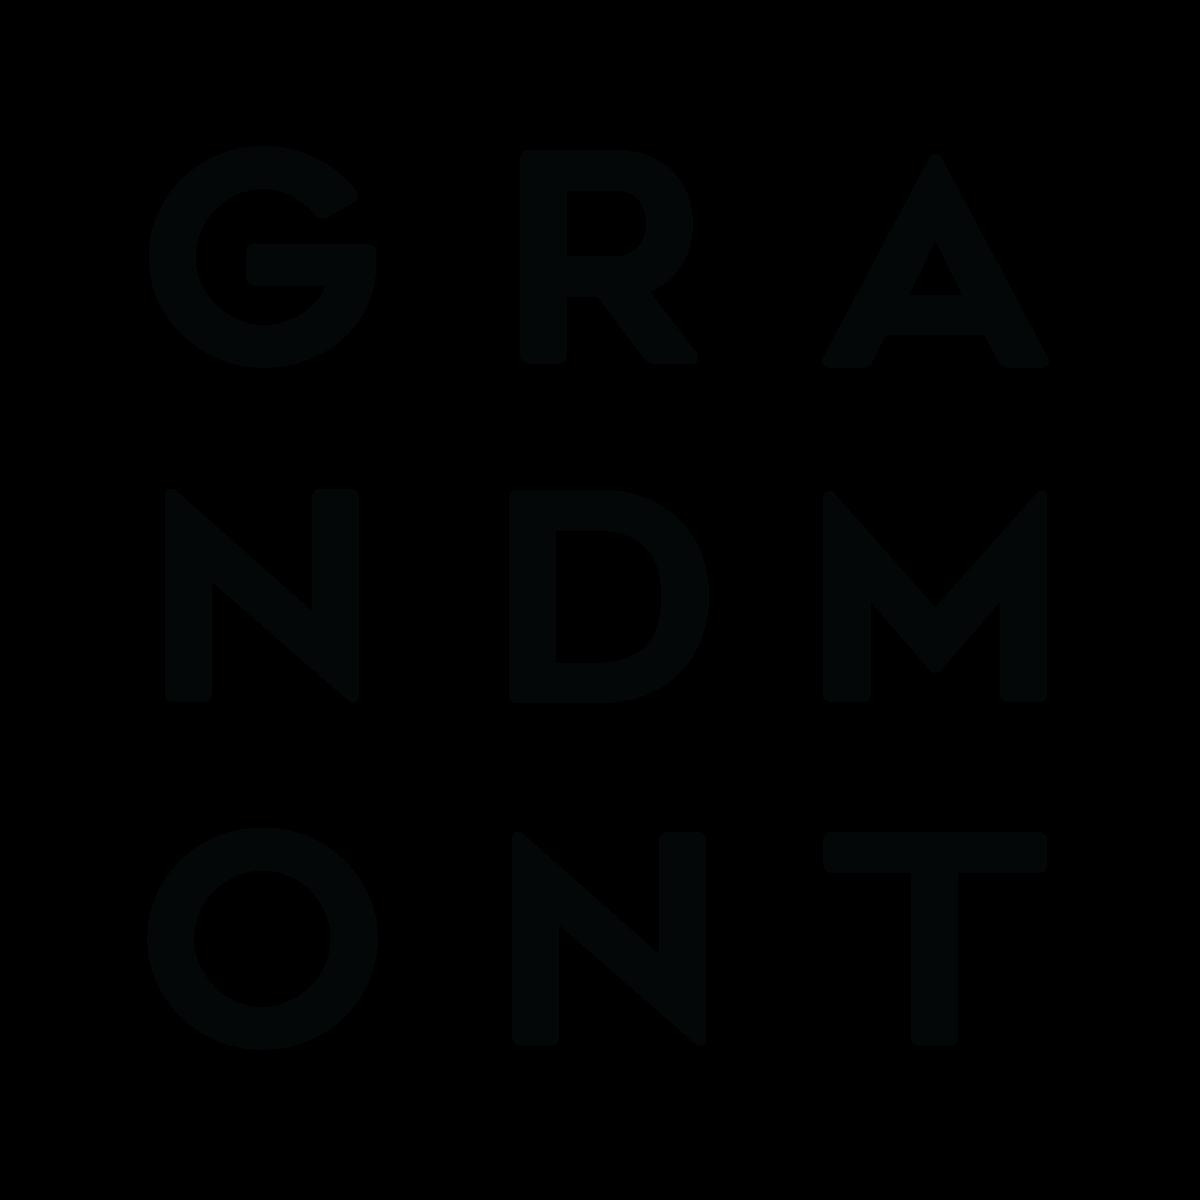 Charles Grandmont